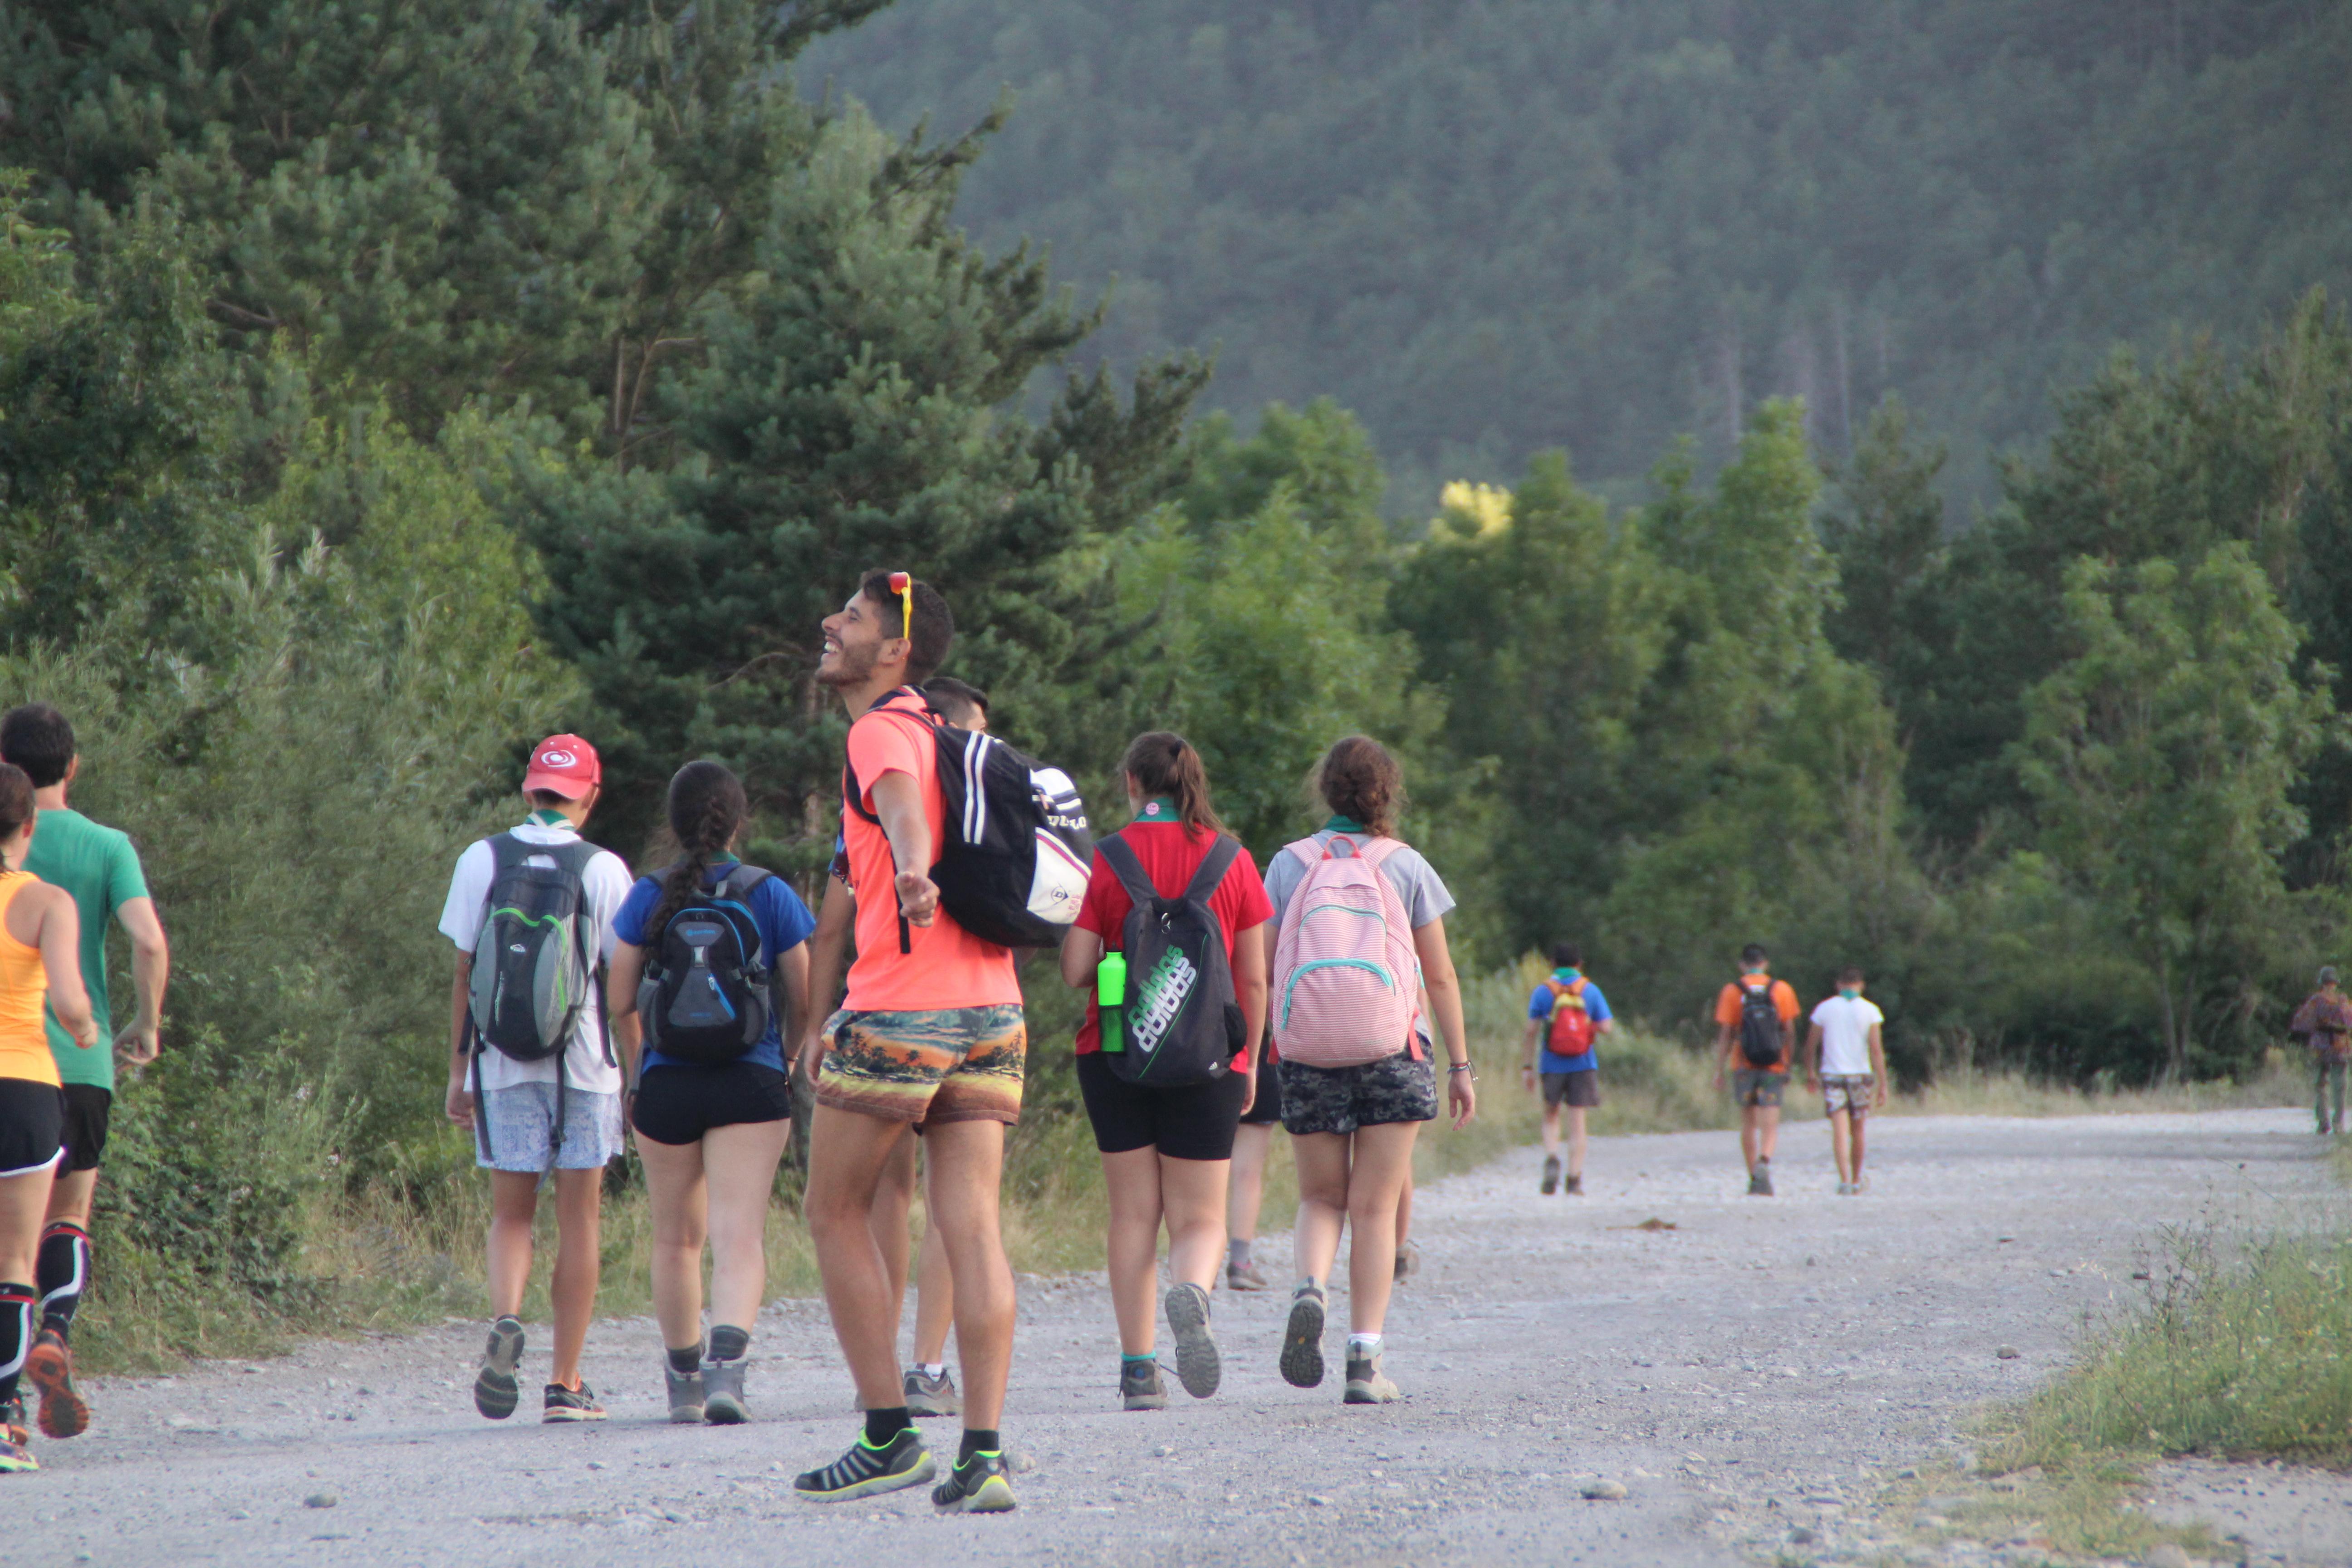 15-16 - Grupo - Campamento de verano - P145